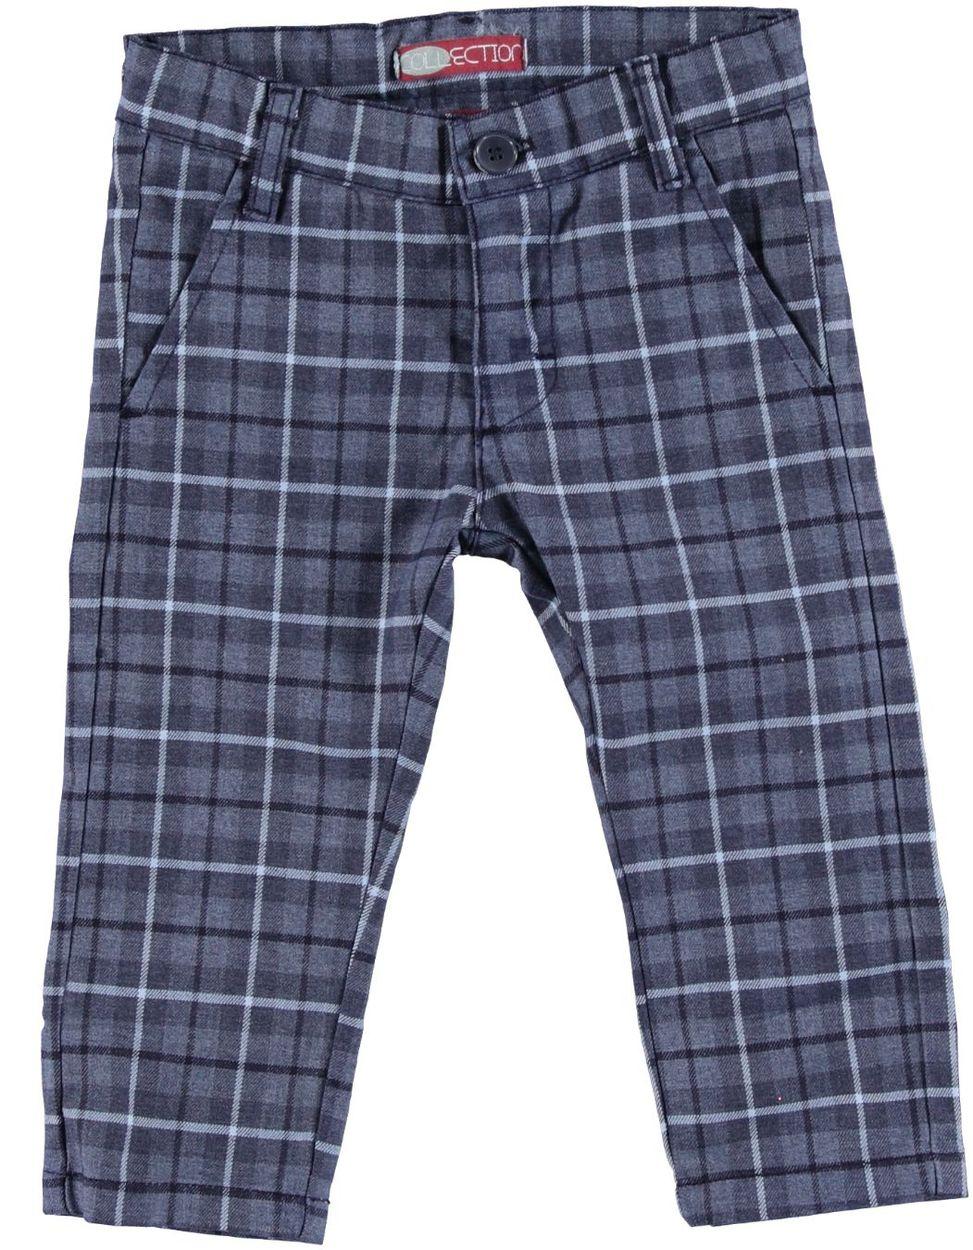 Dettagli su pantalone cino chino pantaloni beige panna cotone elegante mayoral bimbo bambino